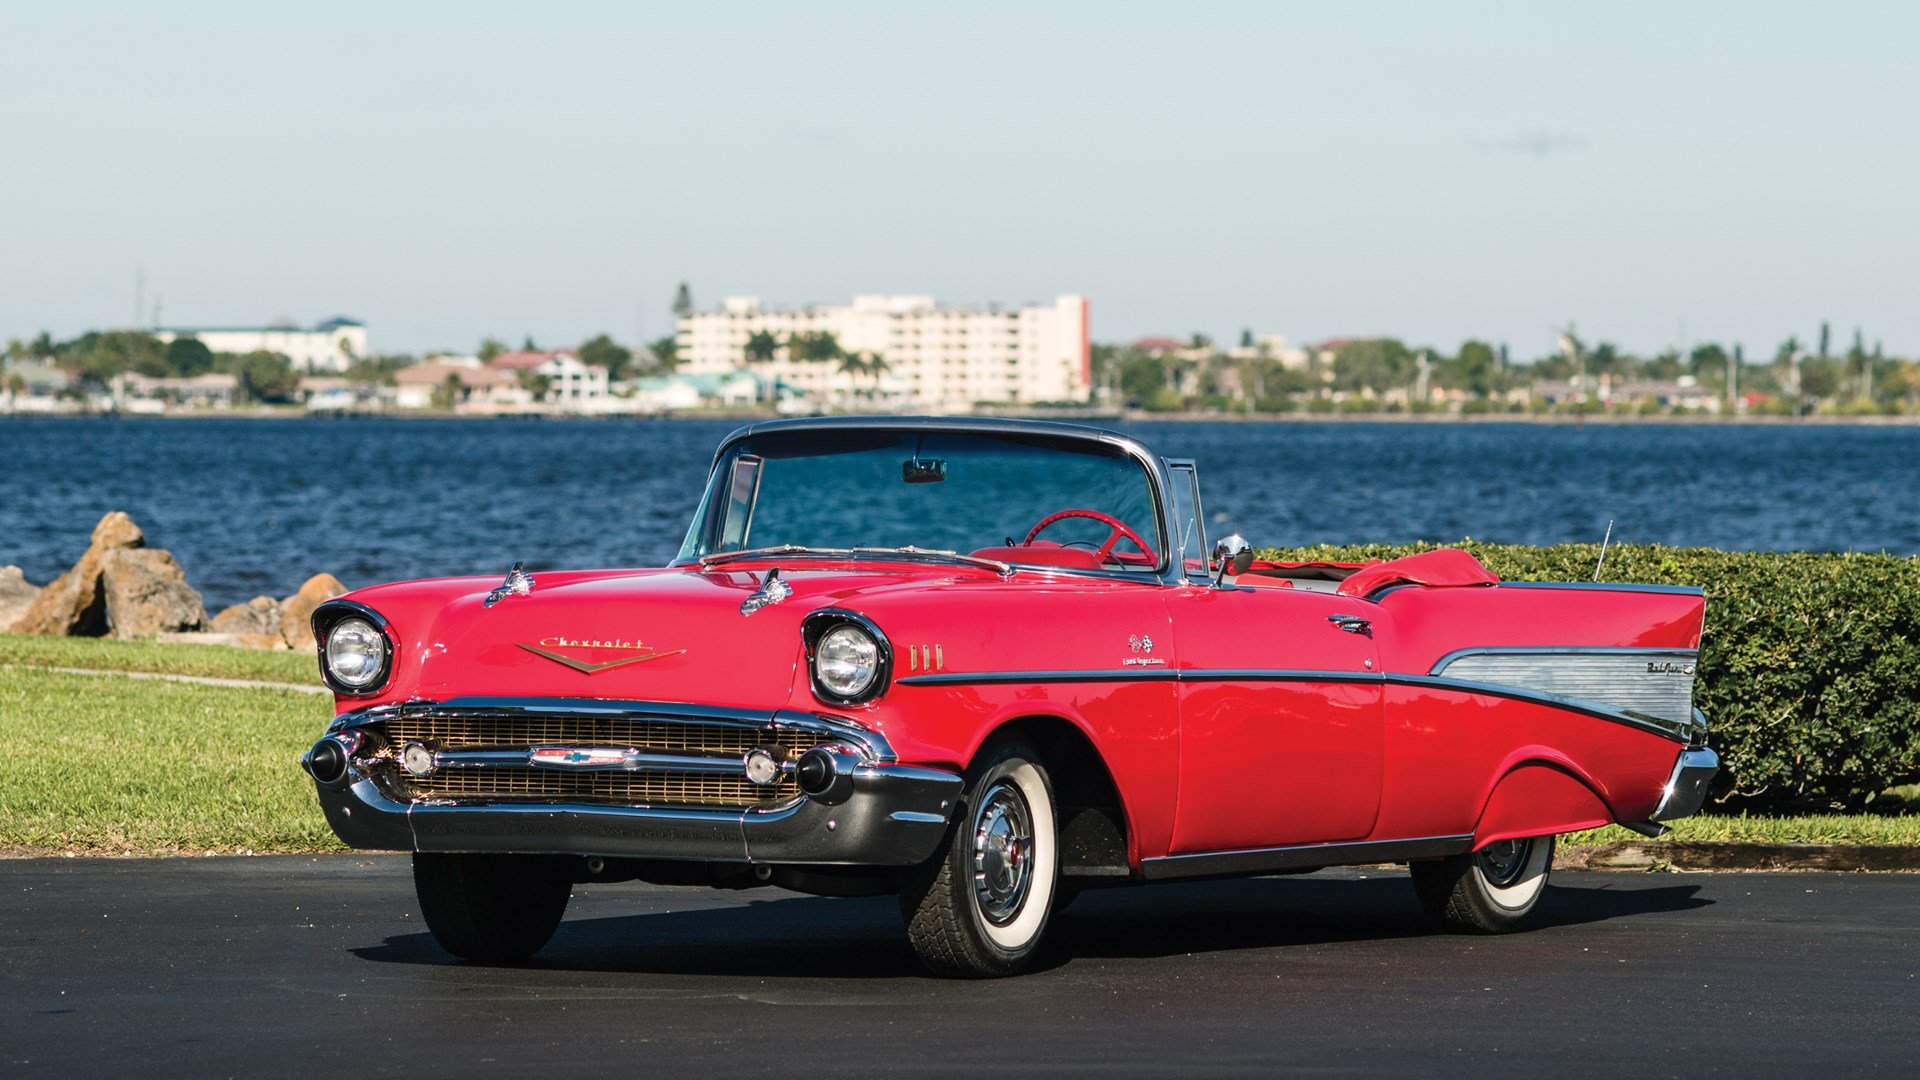 Kelebihan Kekurangan Chevrolet Bel Air 1957 Review